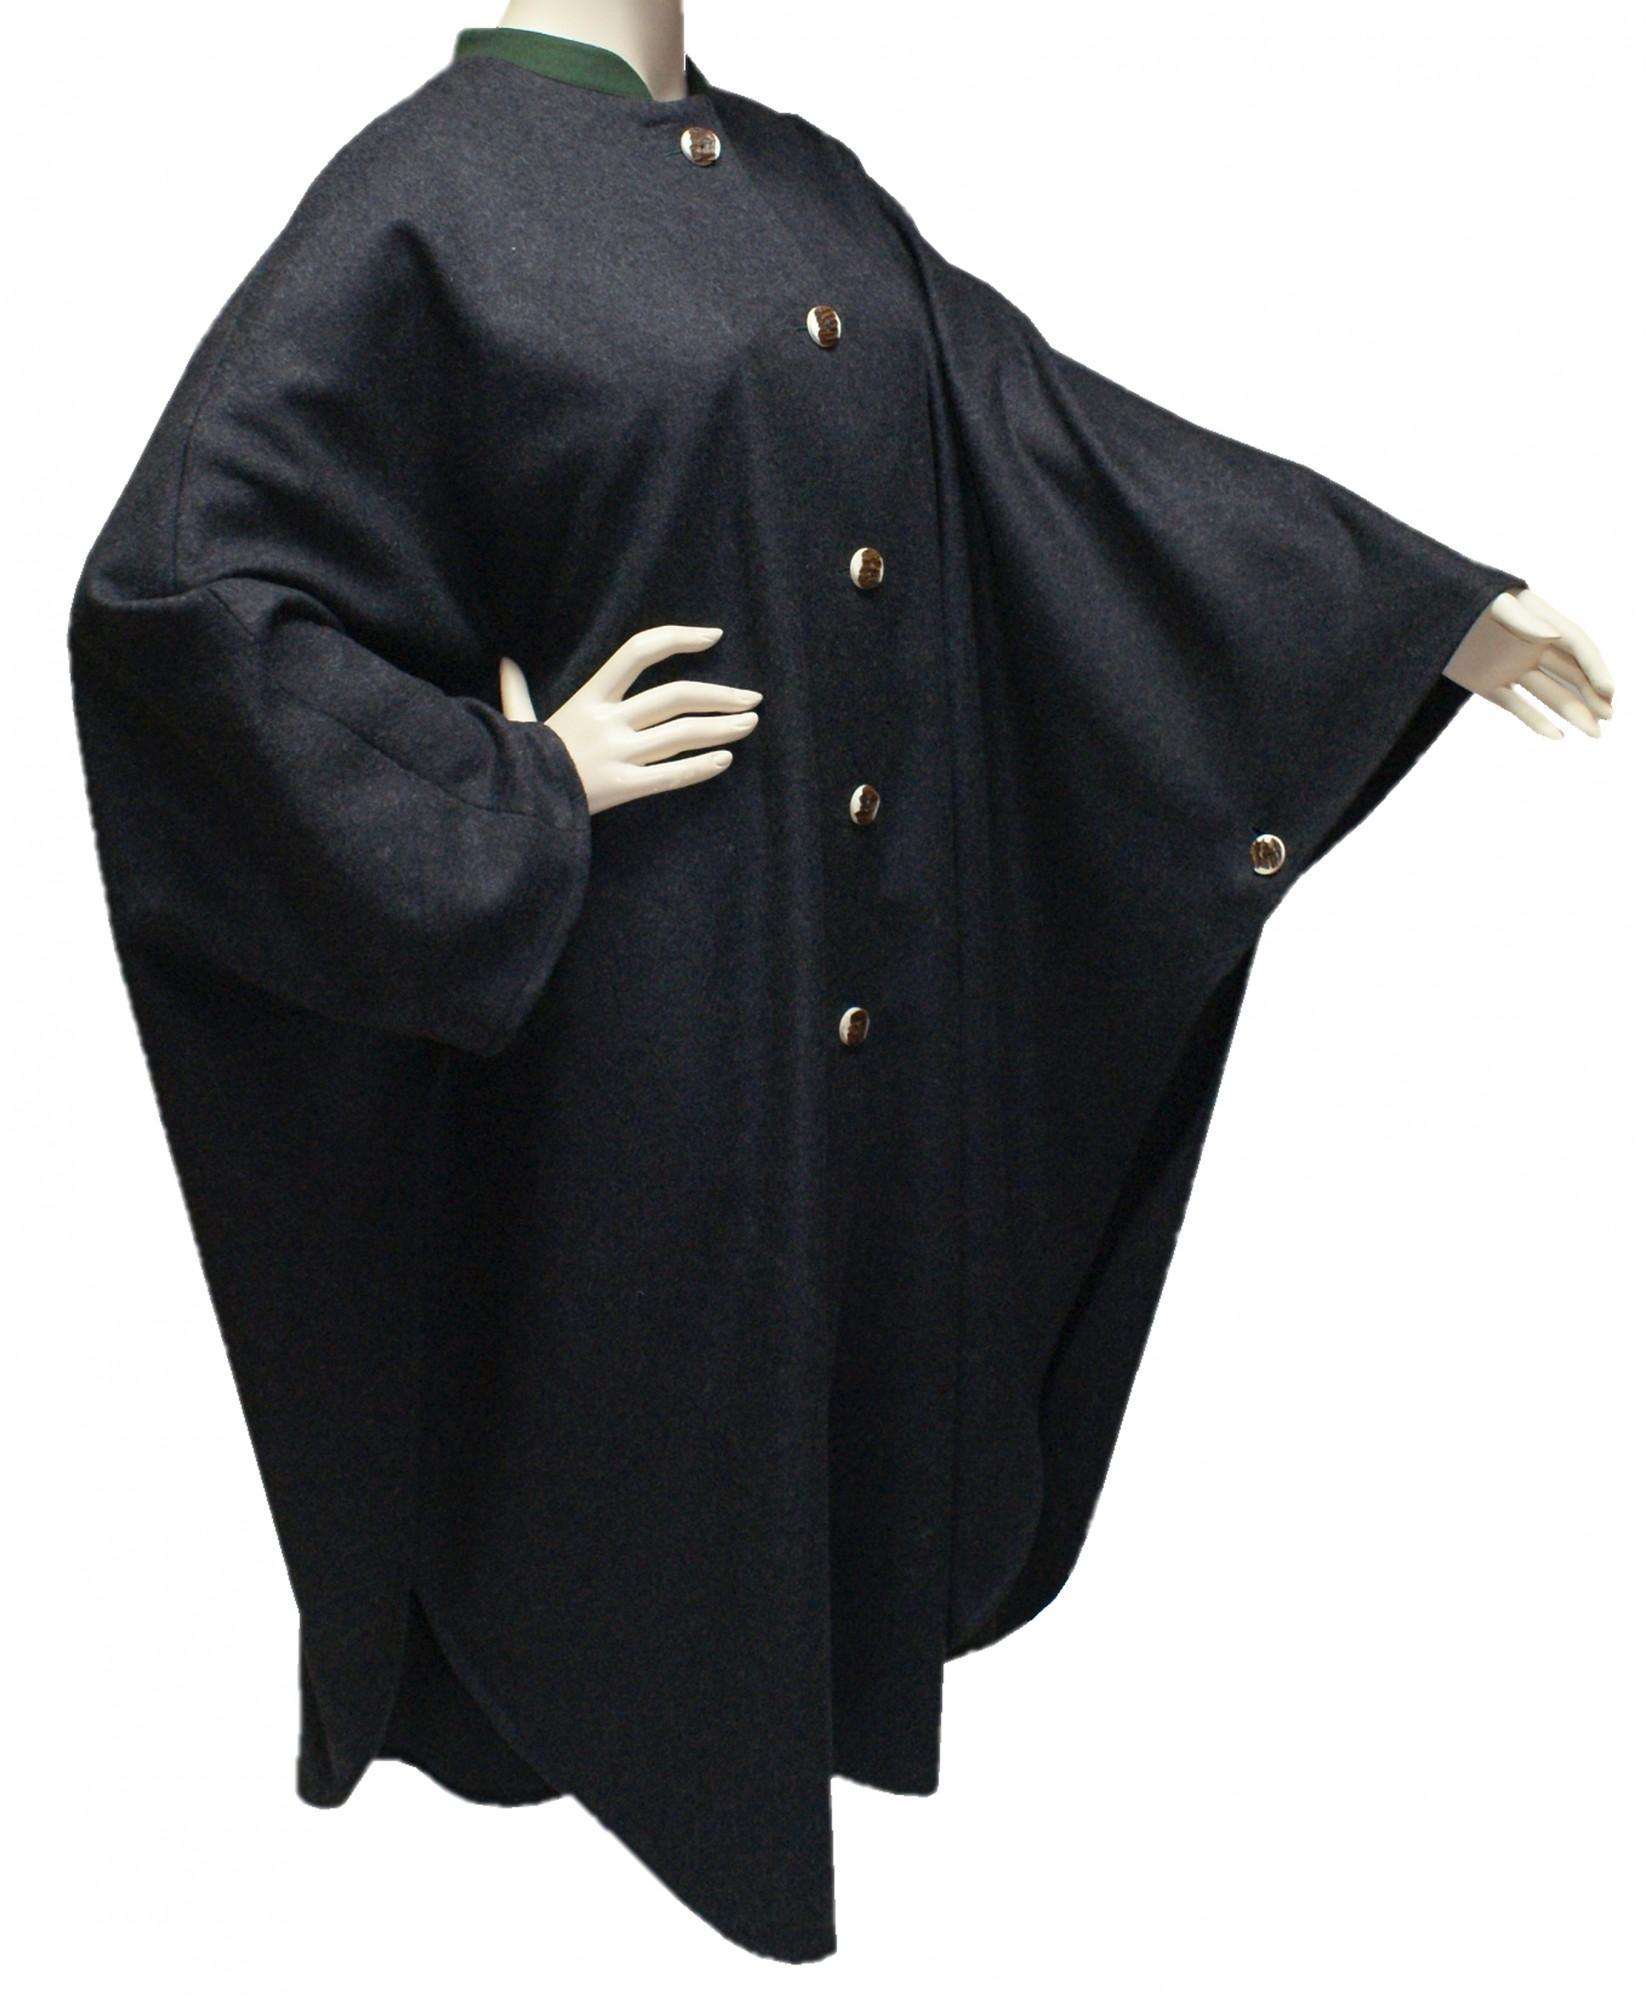 Wetterfleck grau Loden Umhang Cape Poncho Trachtenmantel Pellerine Damen Mantel